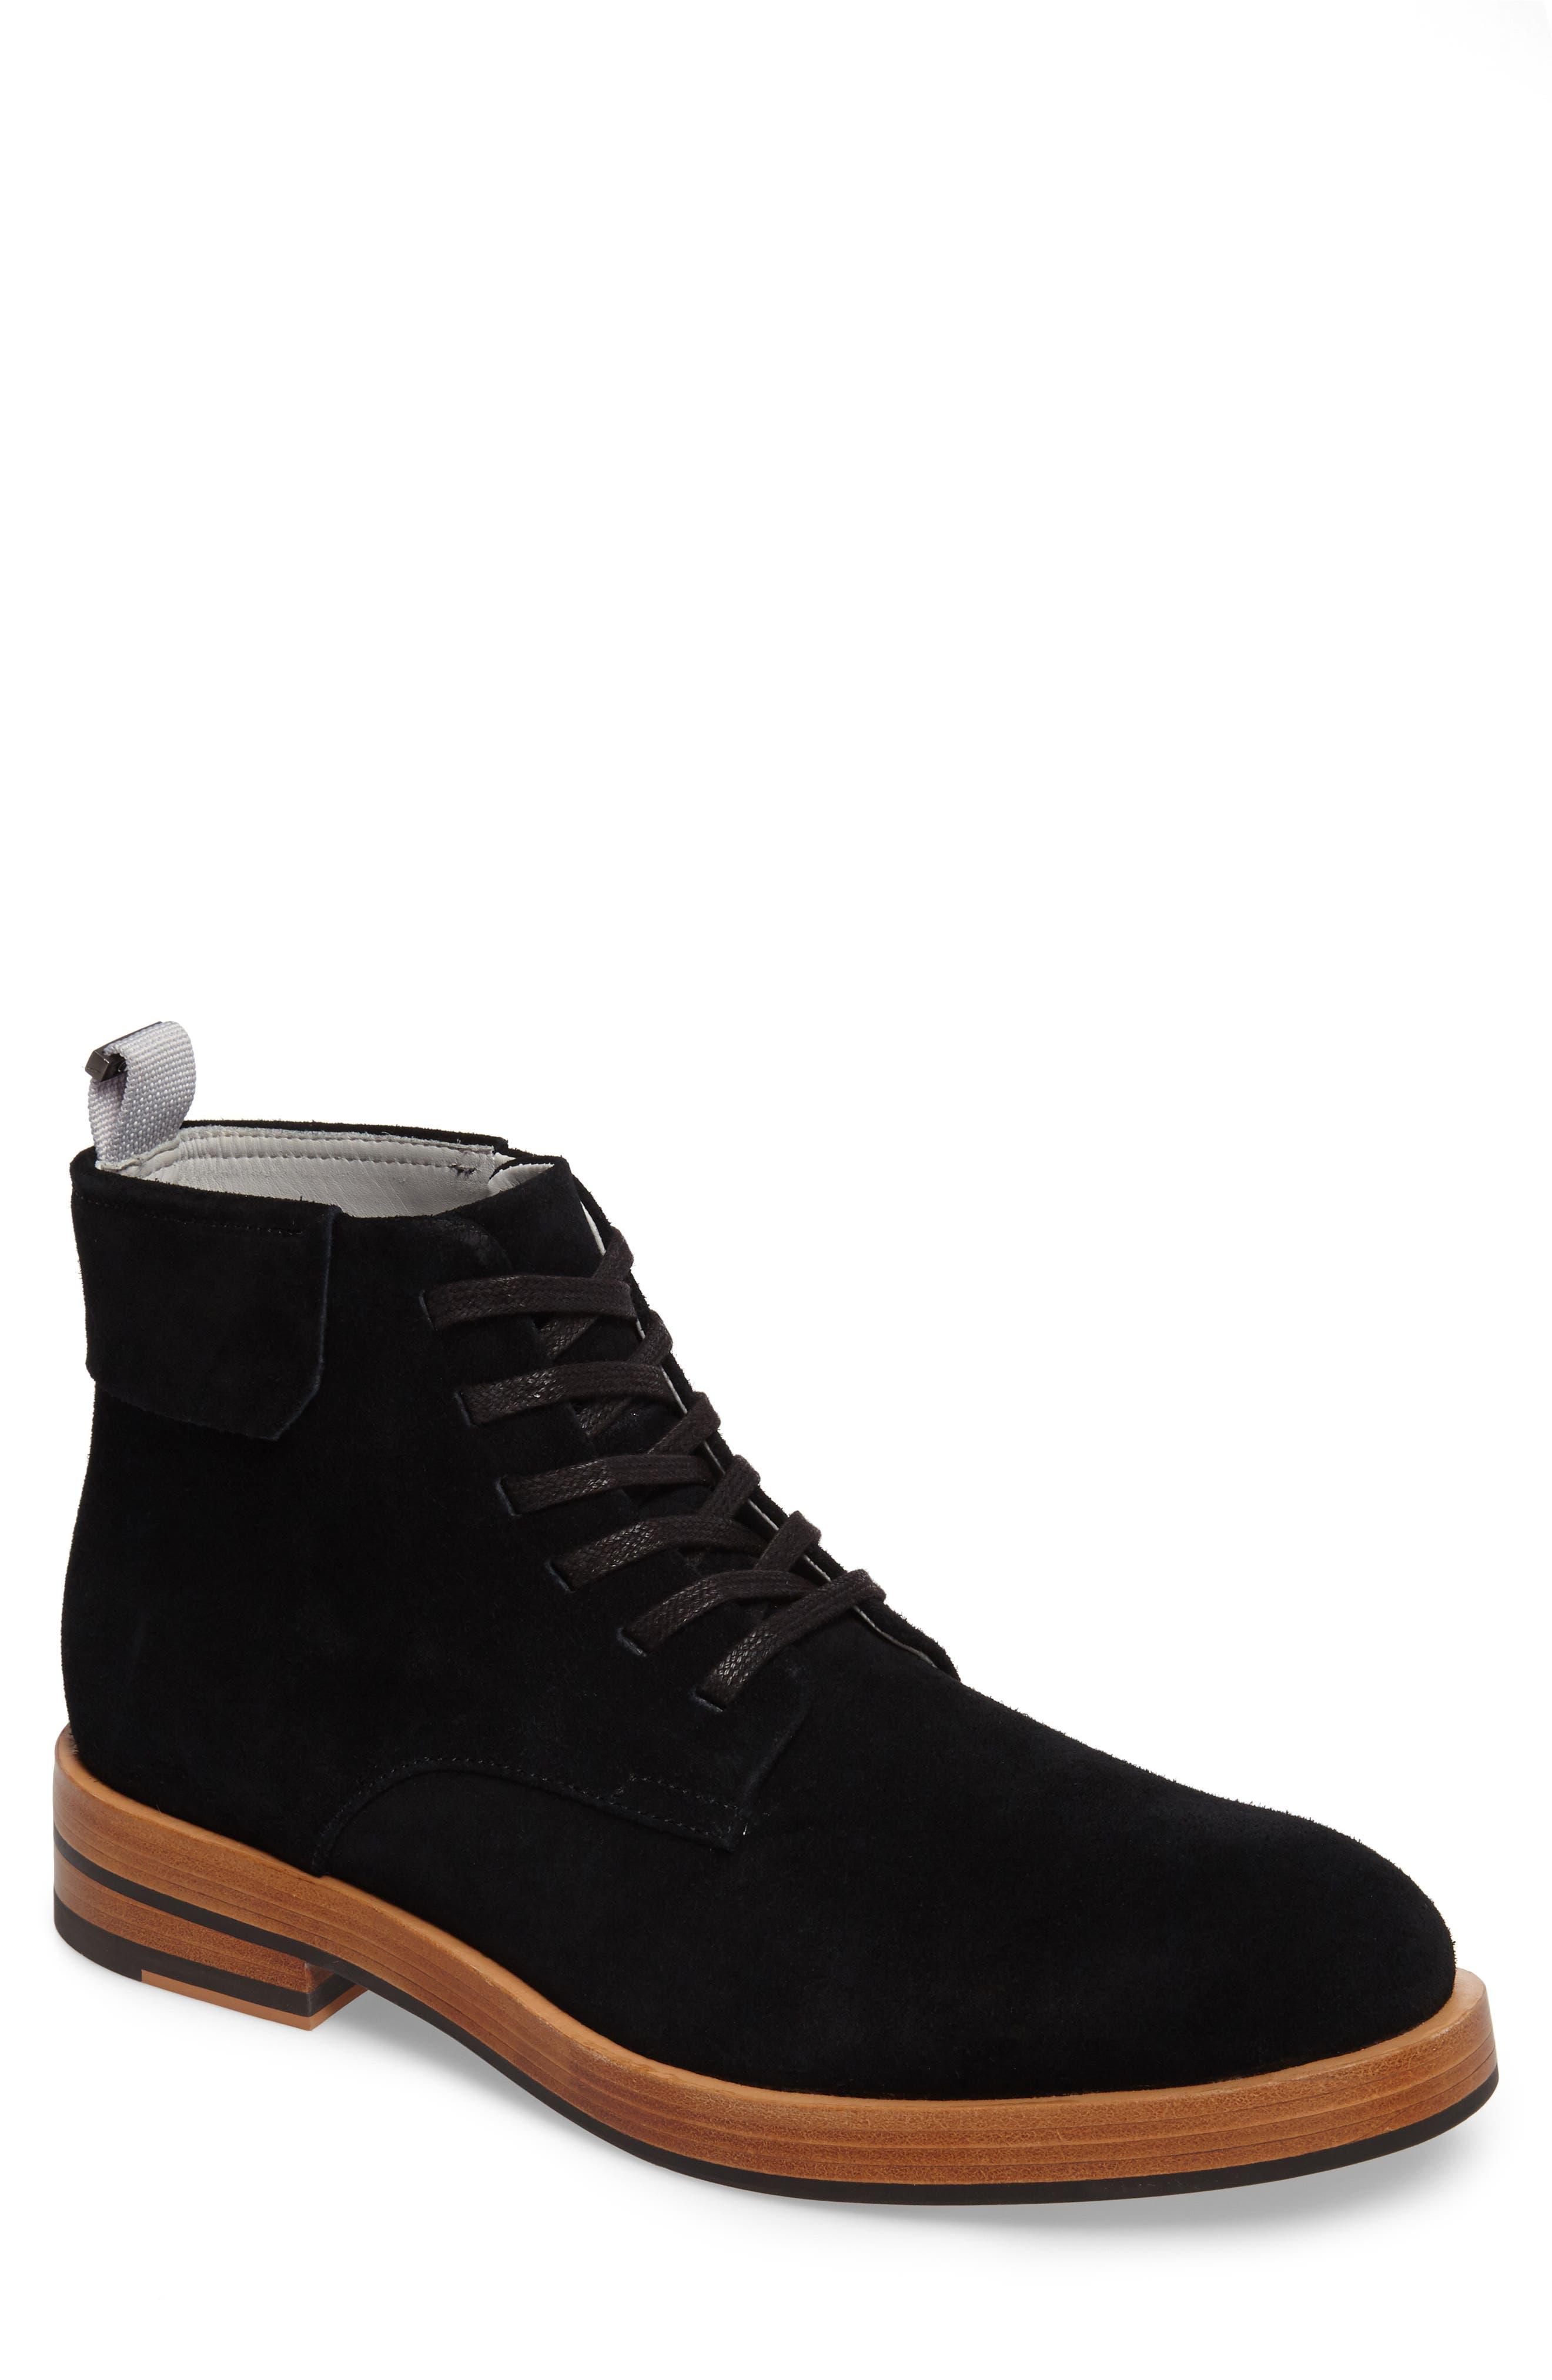 Radburn Plain Toe Boot,                             Main thumbnail 1, color,                             001